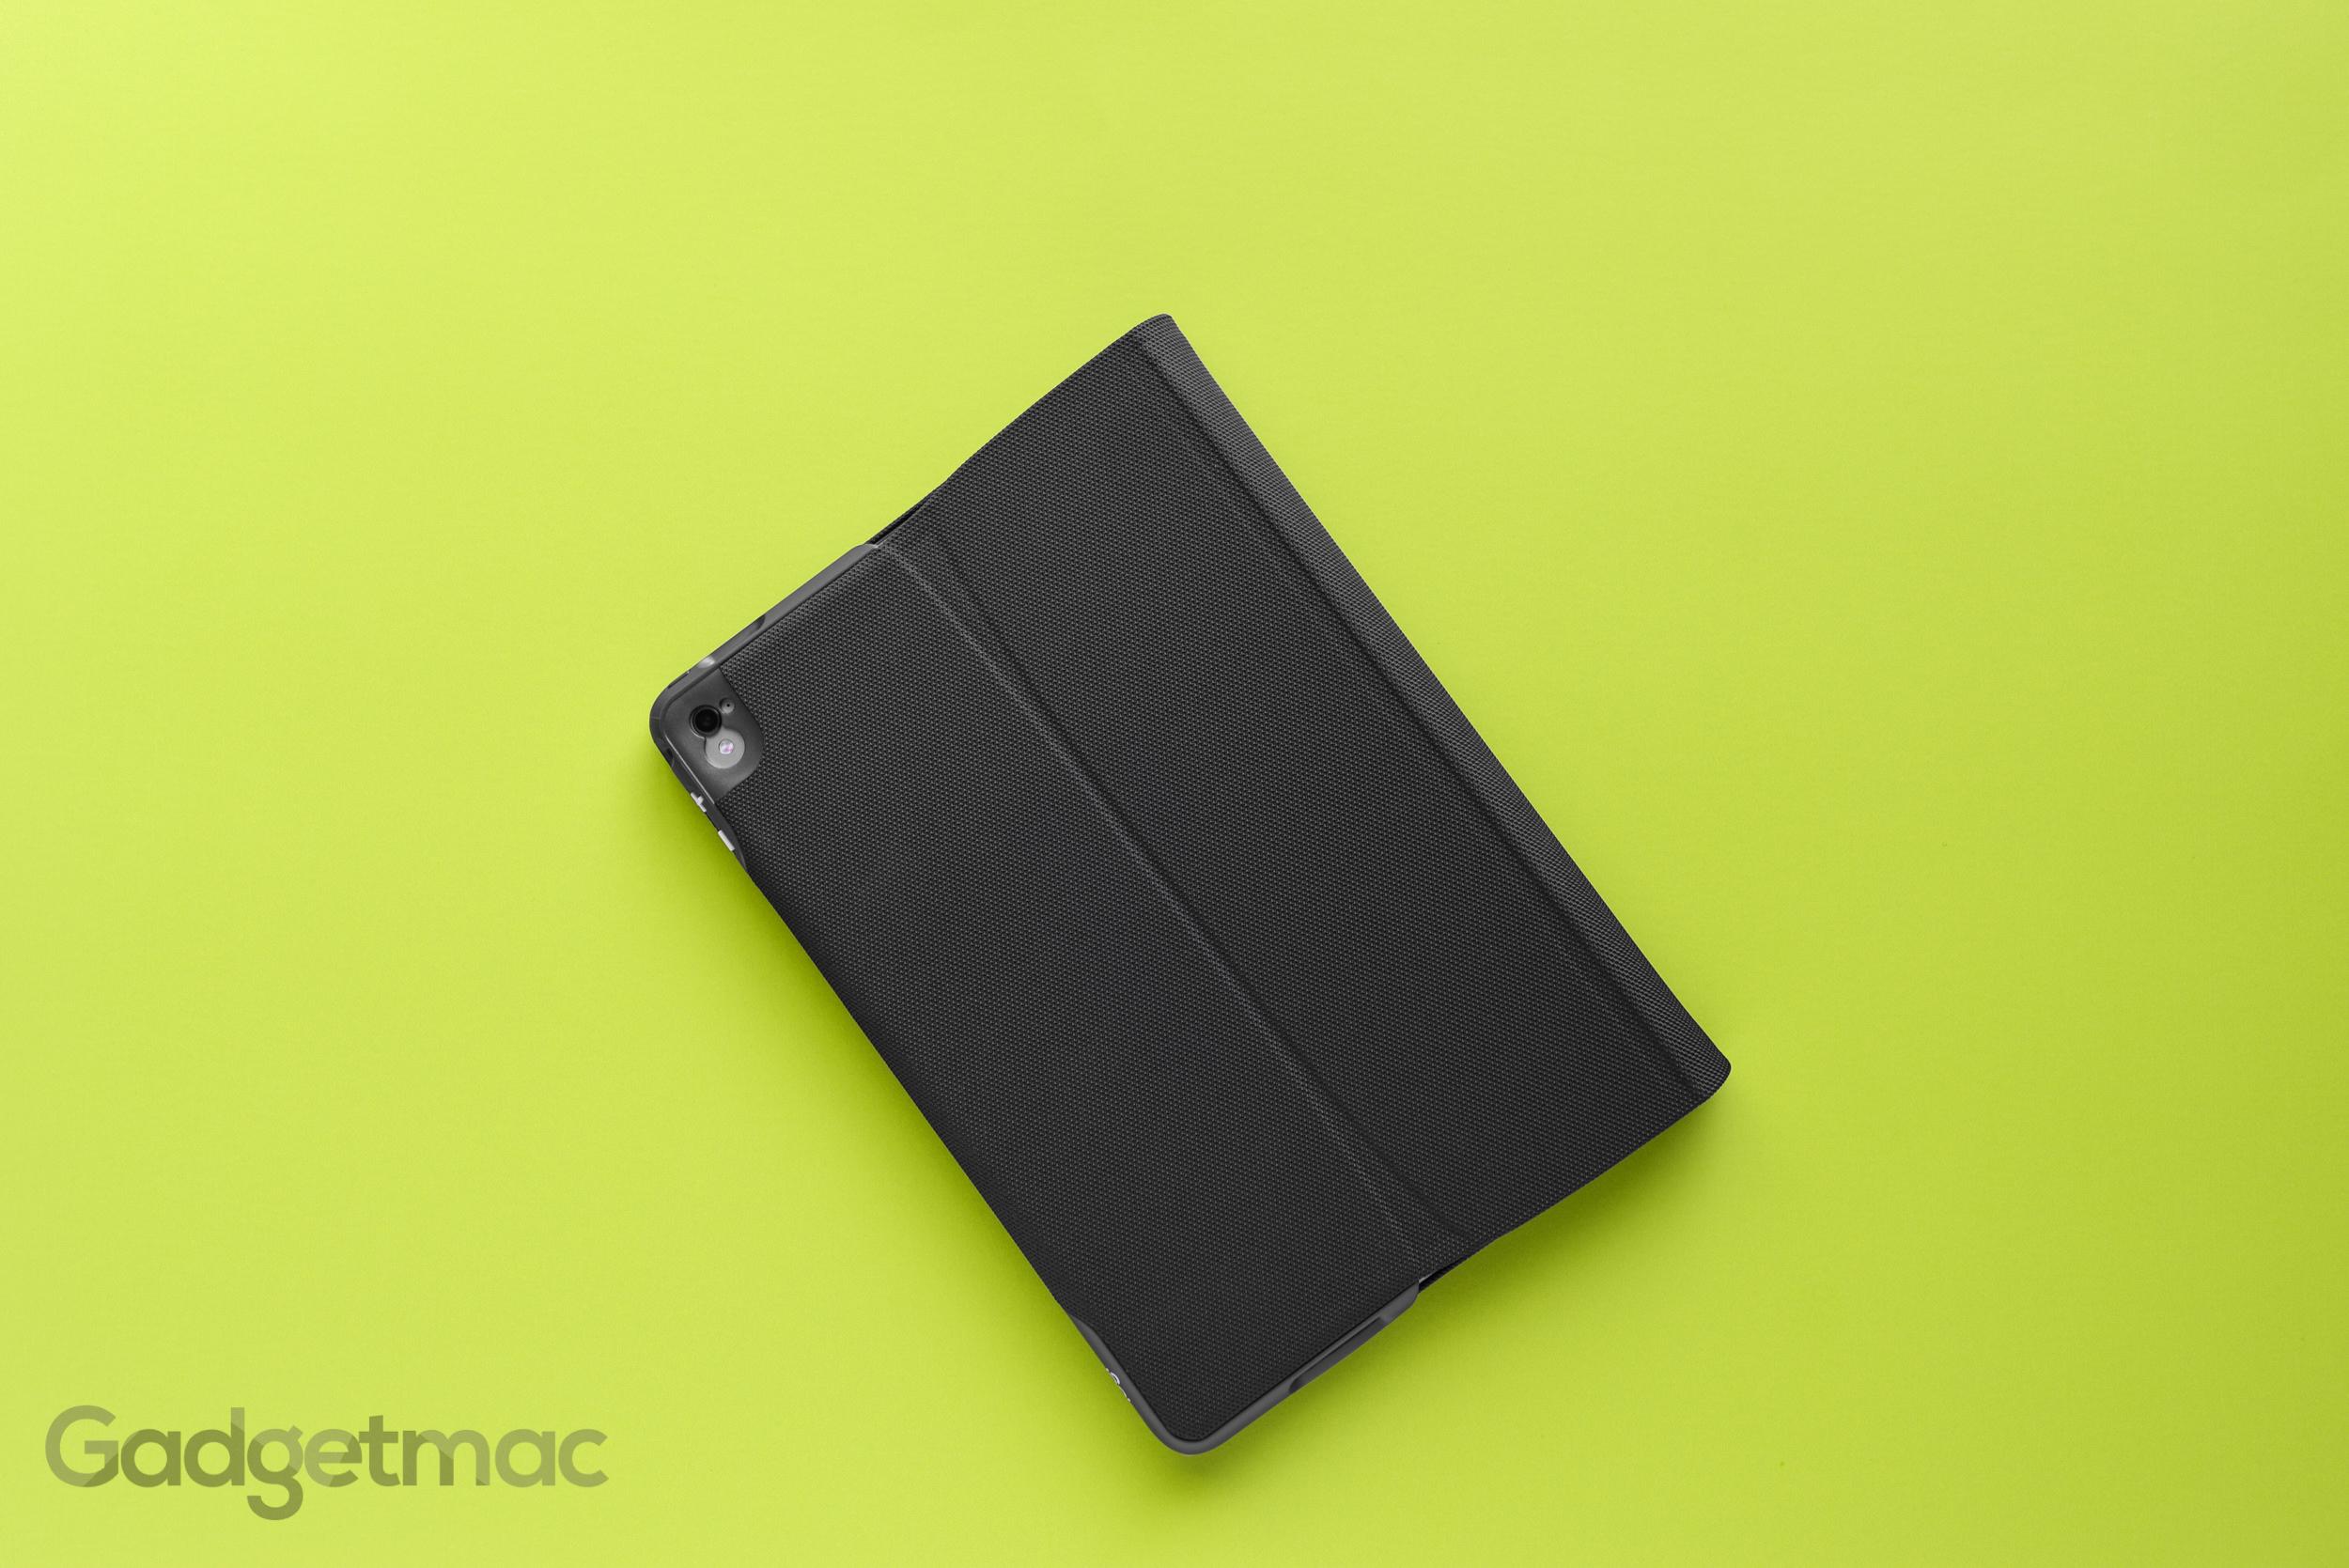 logitech-create-ipad-pro-back-facing-camera.jpg